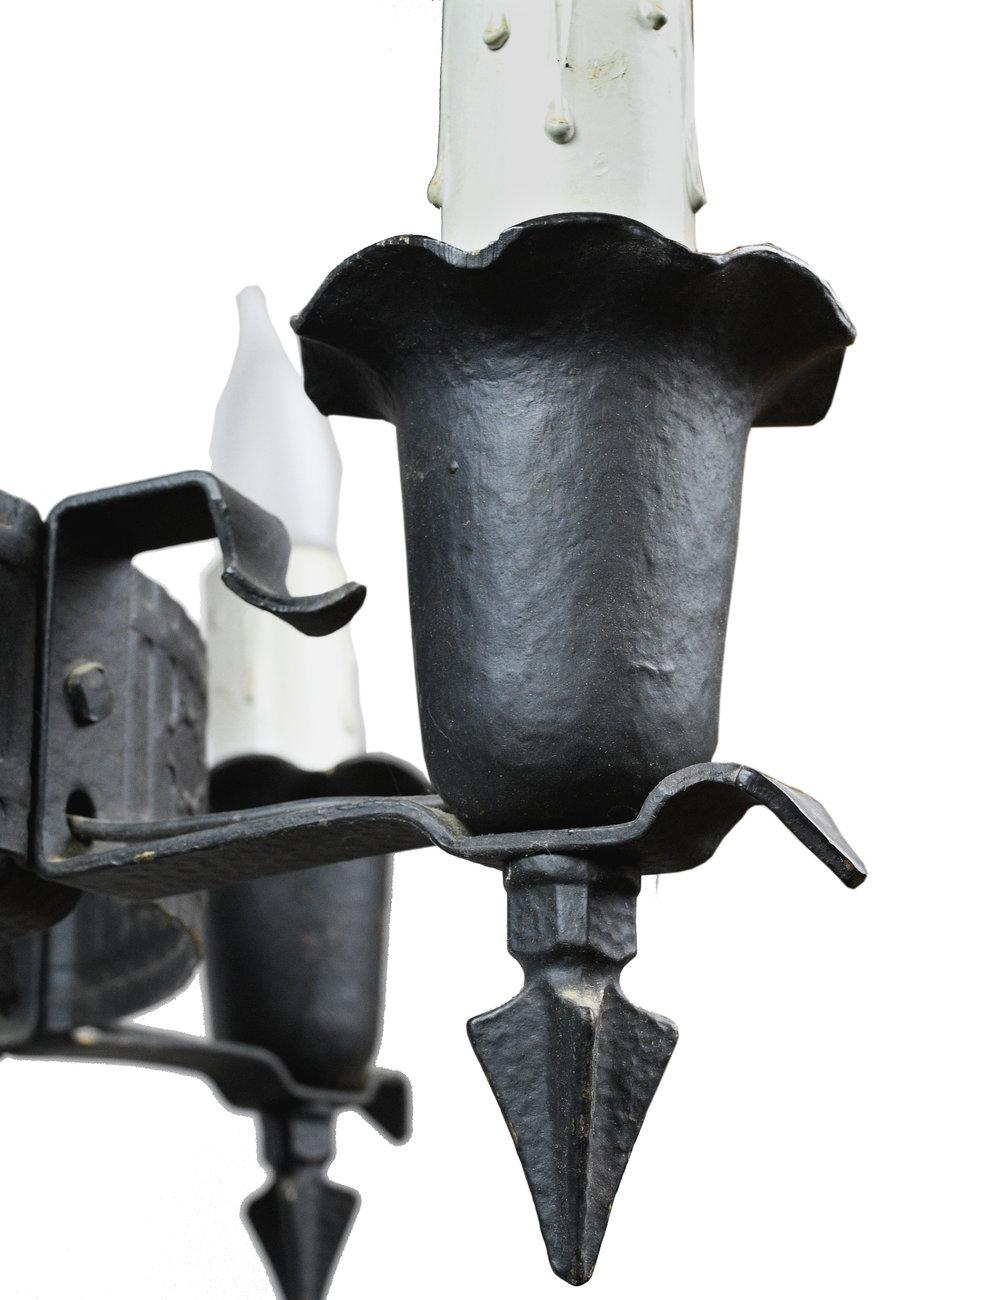 44744-gothic-iron-5-candle-chandleier-reshoot-4.jpg